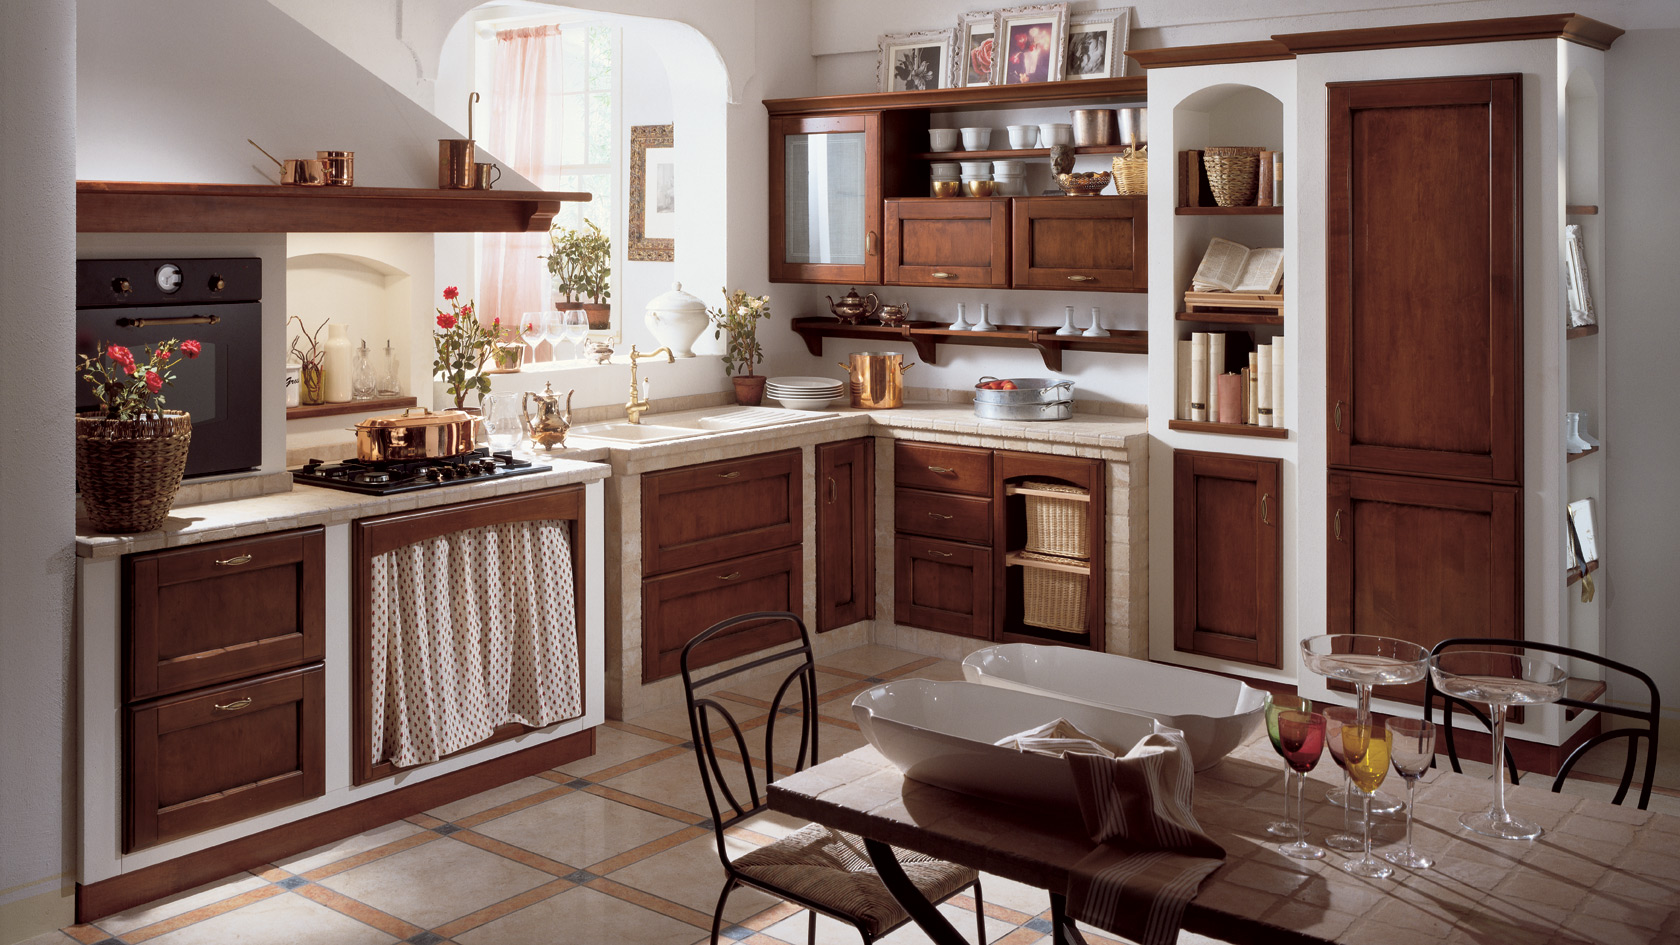 Cucine per case in legno: cucine particolari cucina prezzi ...